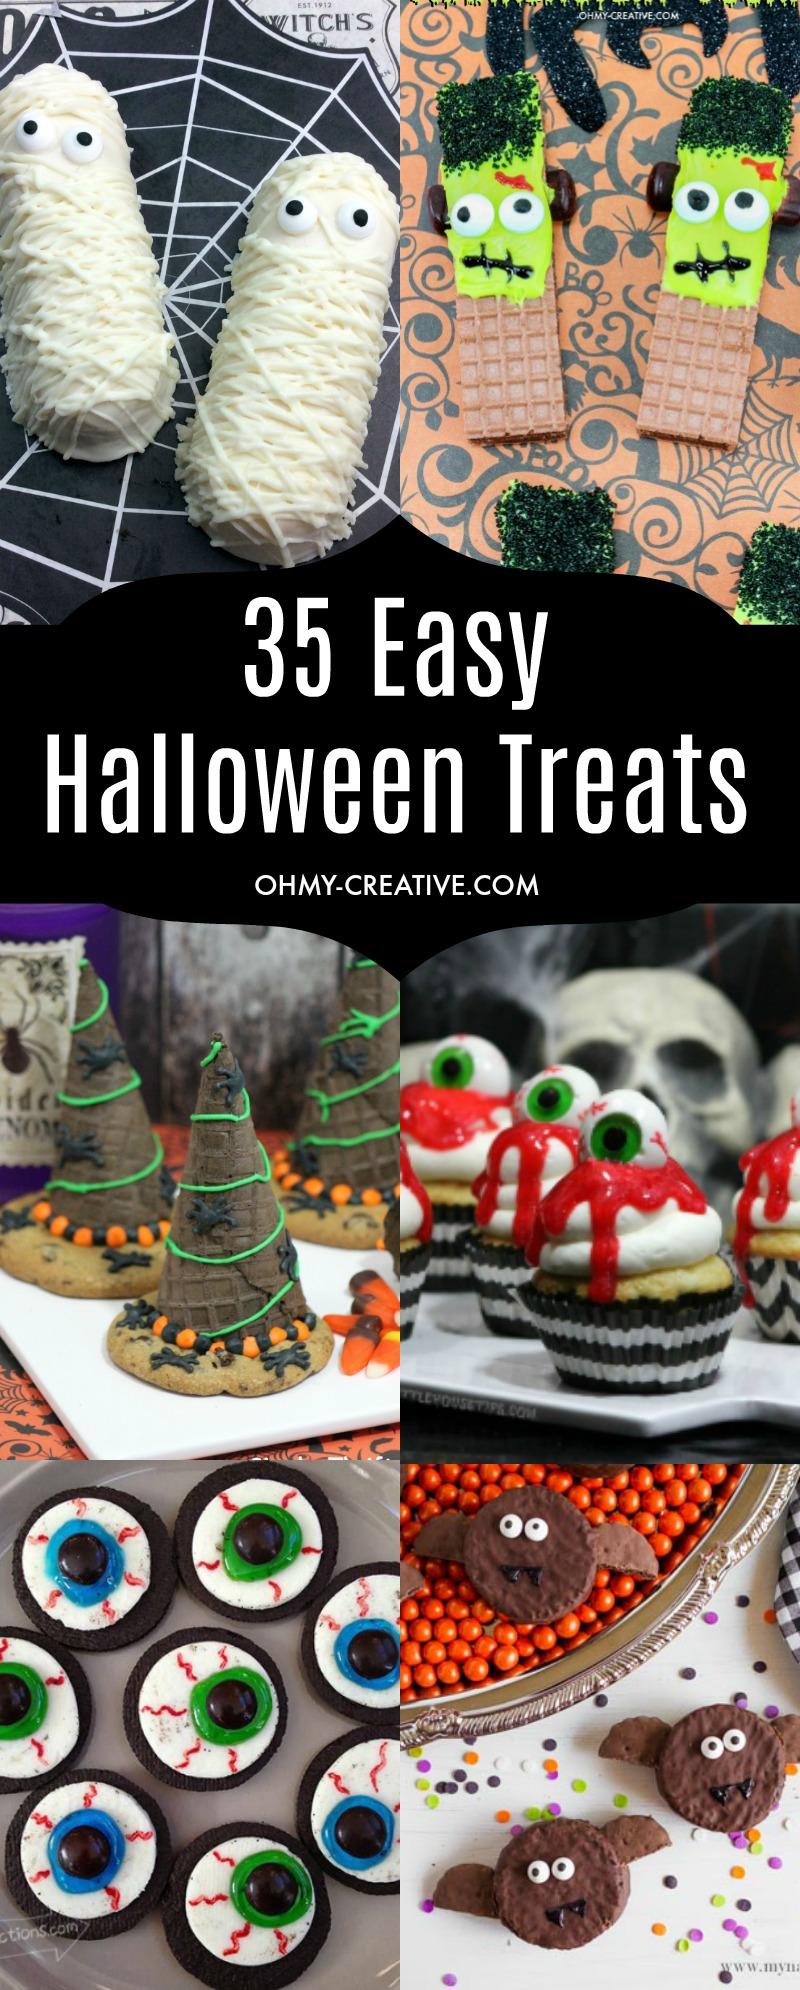 more easy halloween treats here